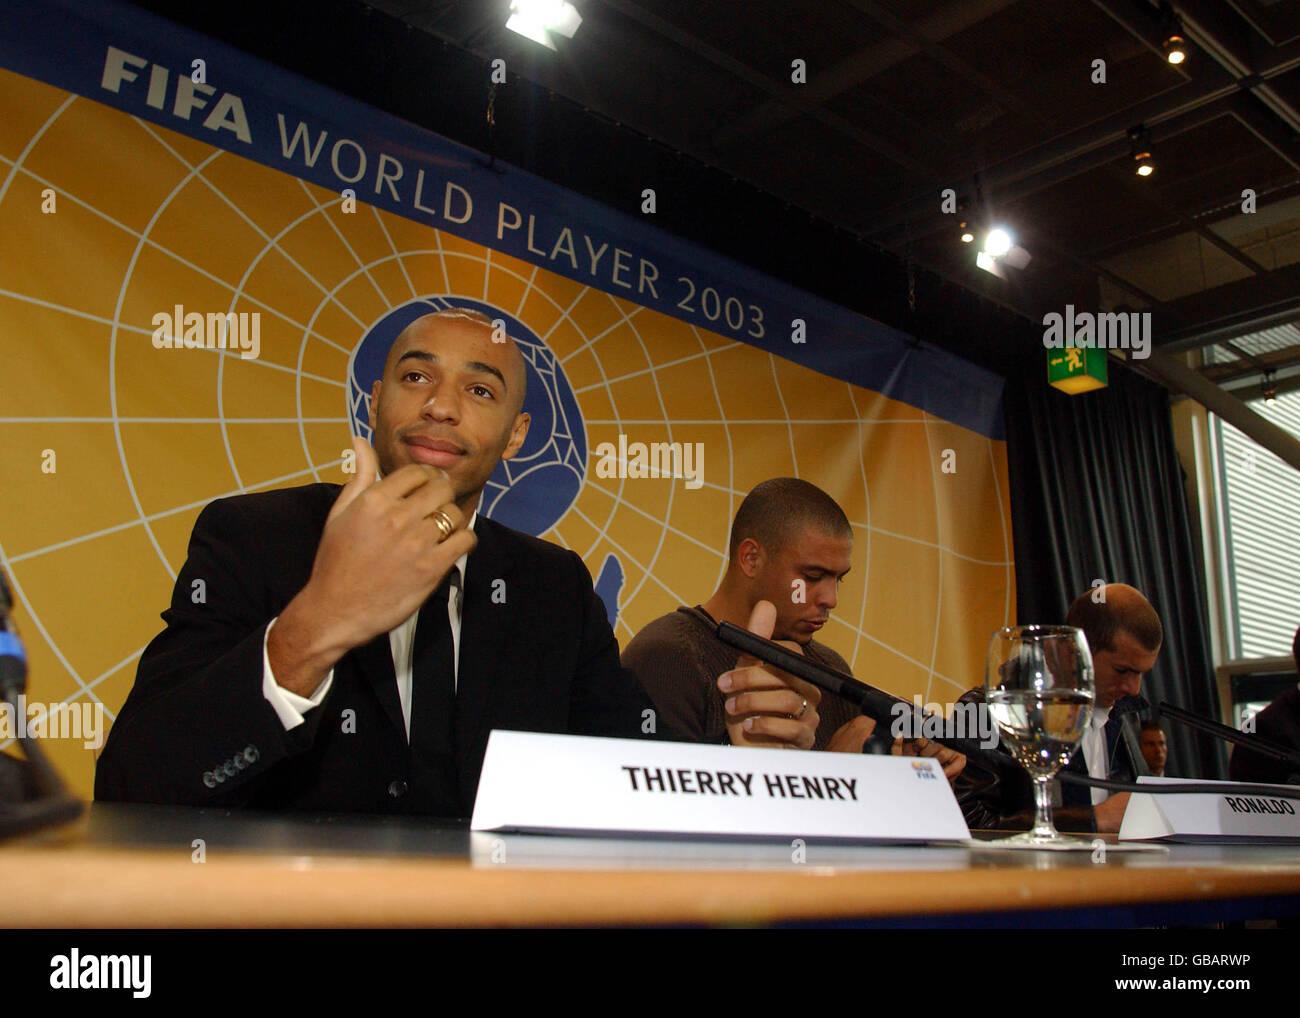 Soccer -Fifa World Player Award - Stock Image